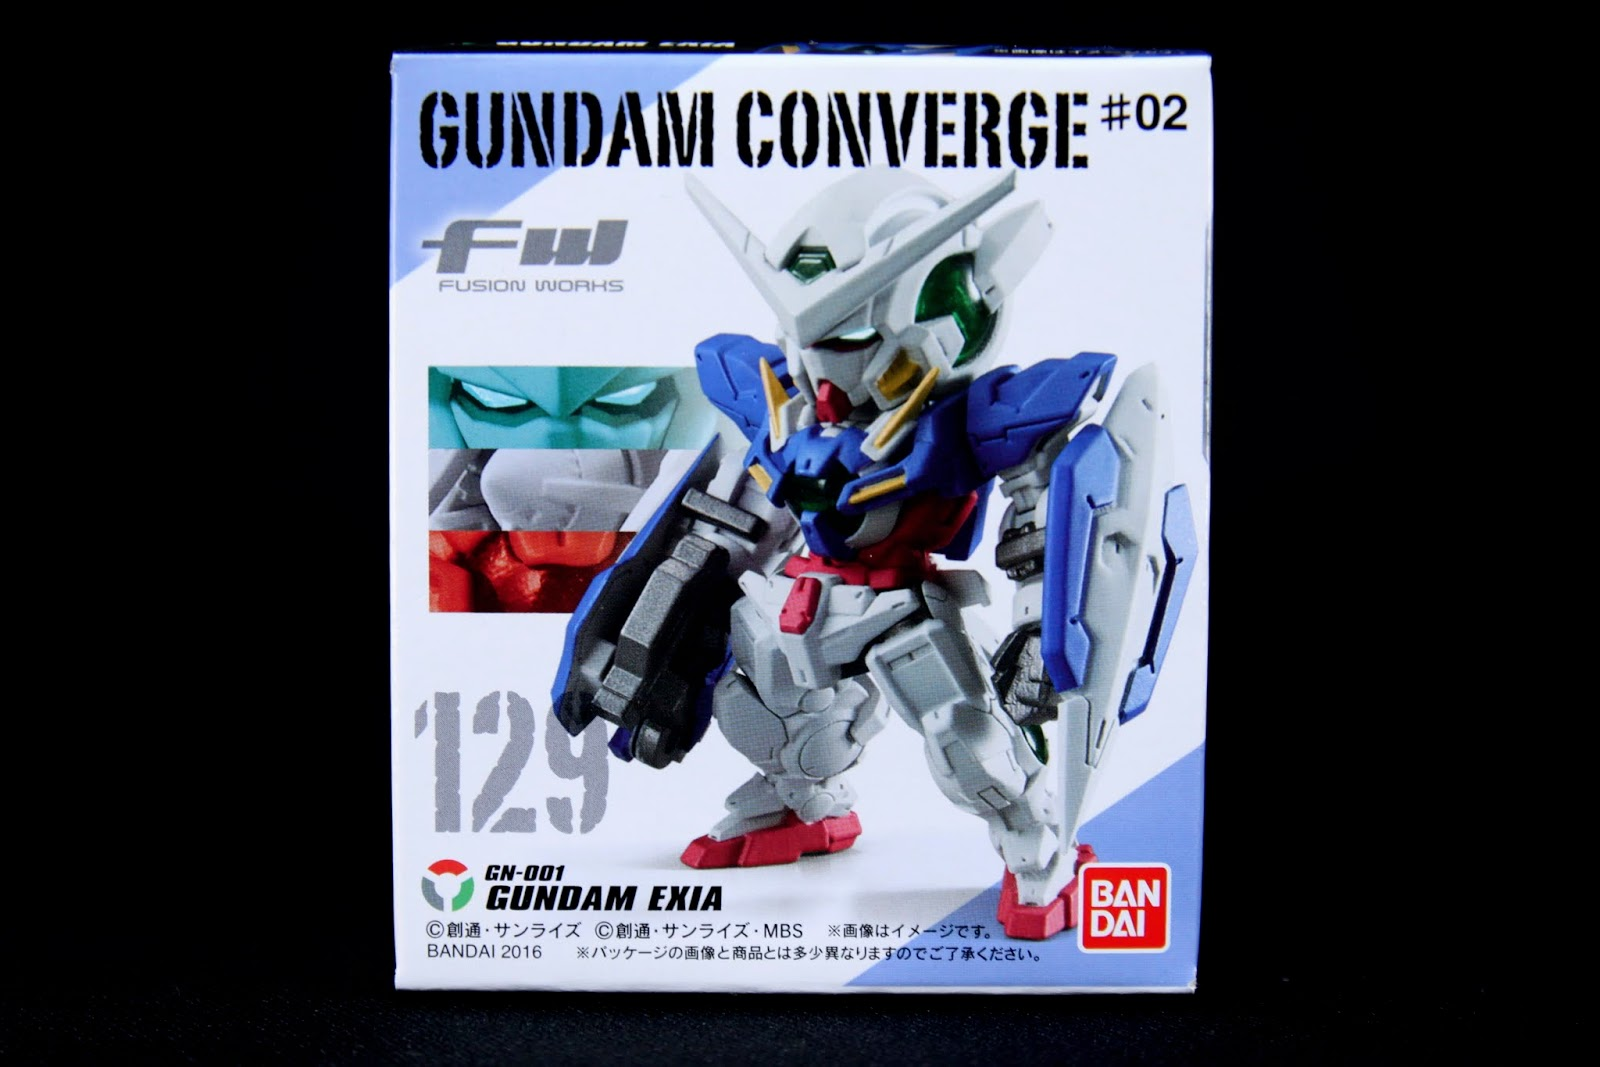 No 129 GN-001 GUNDAM EXIA; Gundam OO第一季的主役機